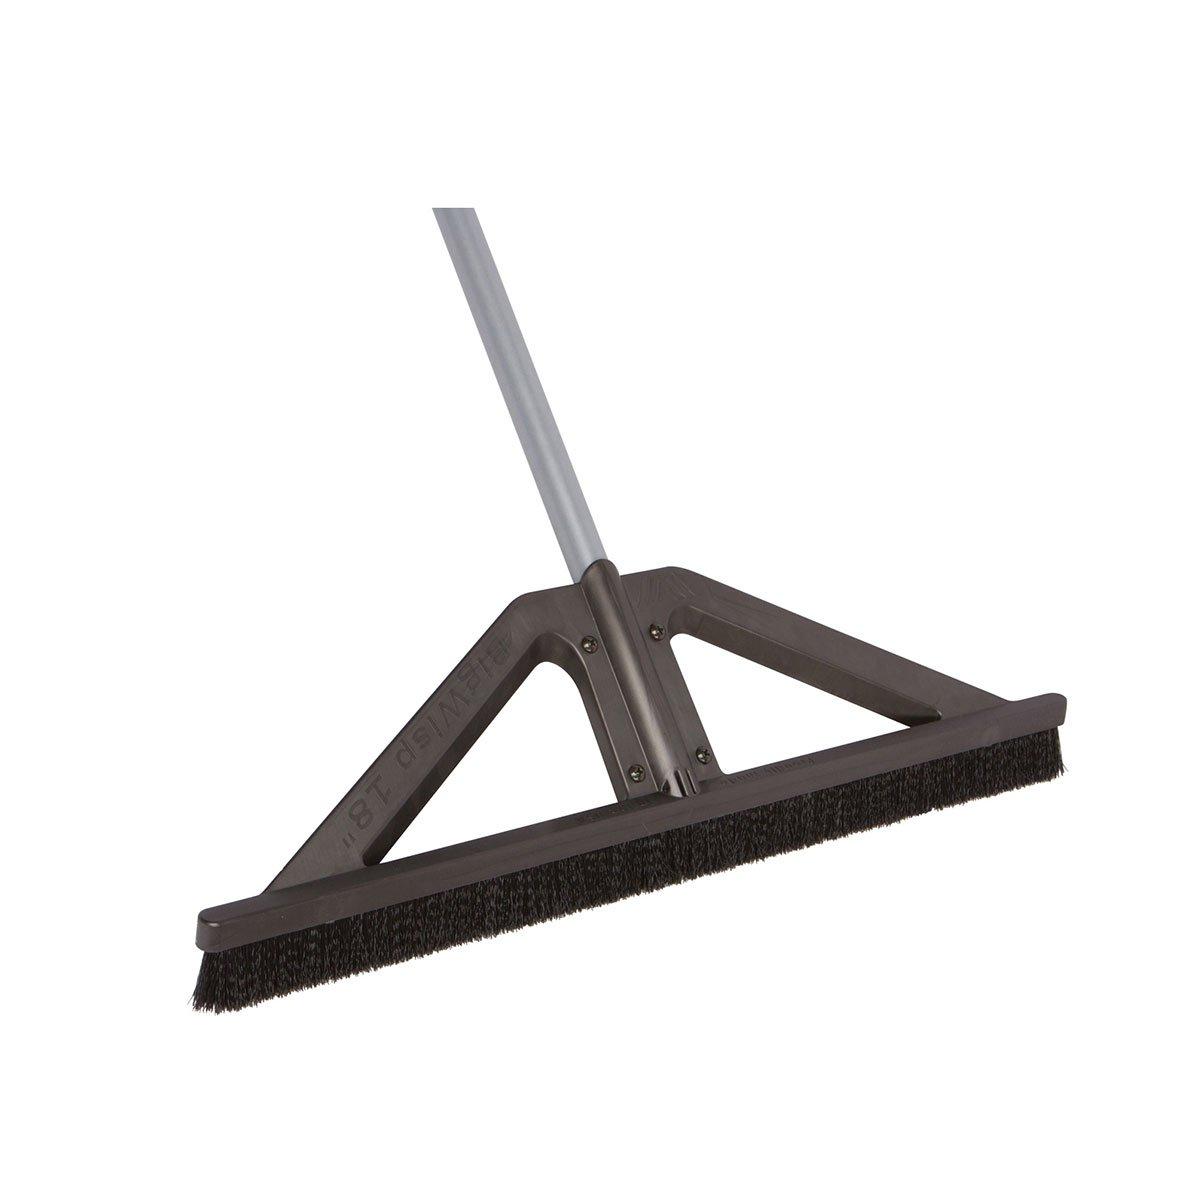 bigWISP, Lightweight Push Broom Best Outdoor Broom for Leaves, Garage and Decks with Bristle Seal Technology (18'')